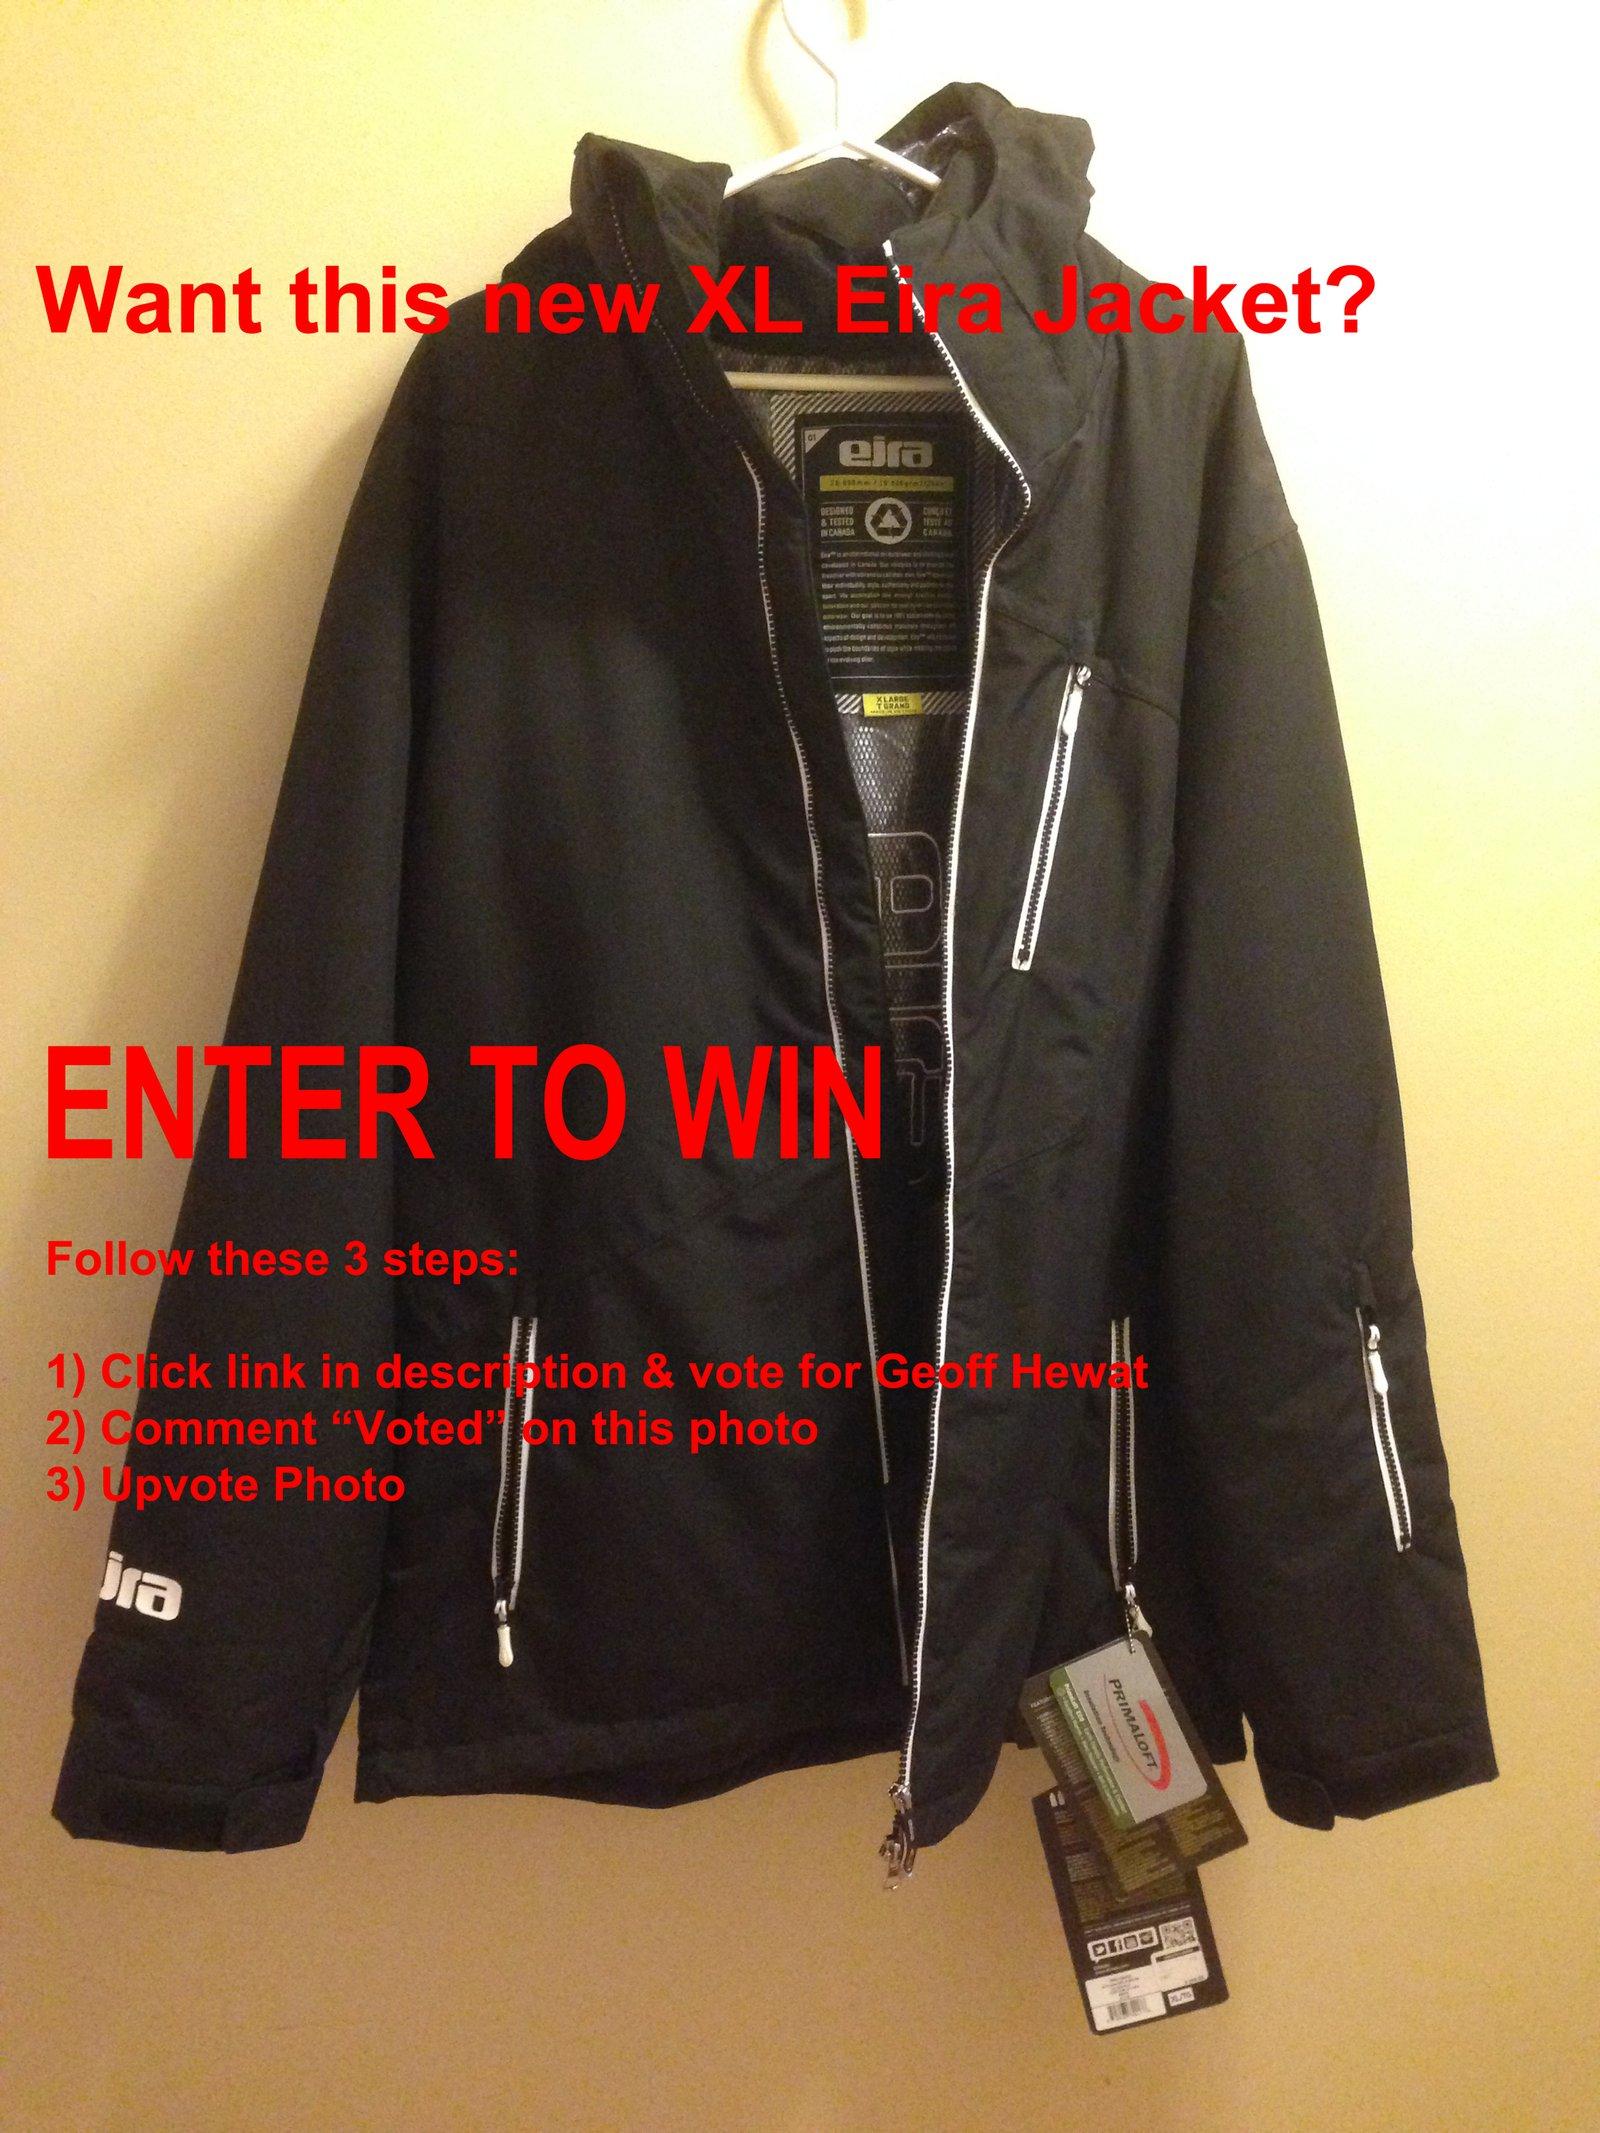 CONTEST: Win Black XL Eira Jacket